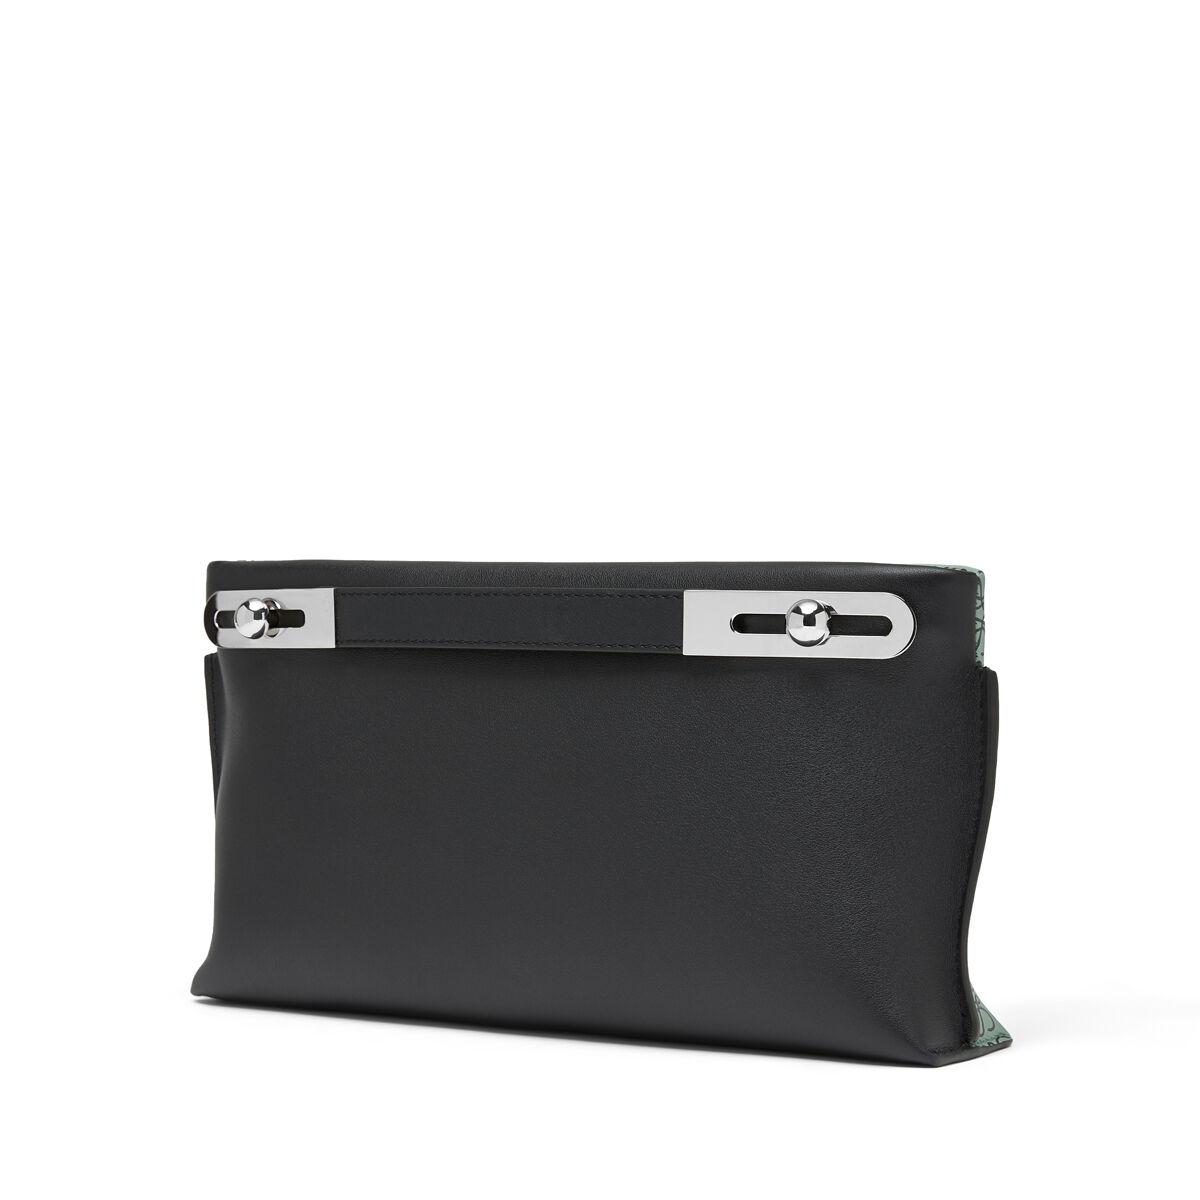 LOEWE Missy Repeat Small Bag Vetiver/Black all